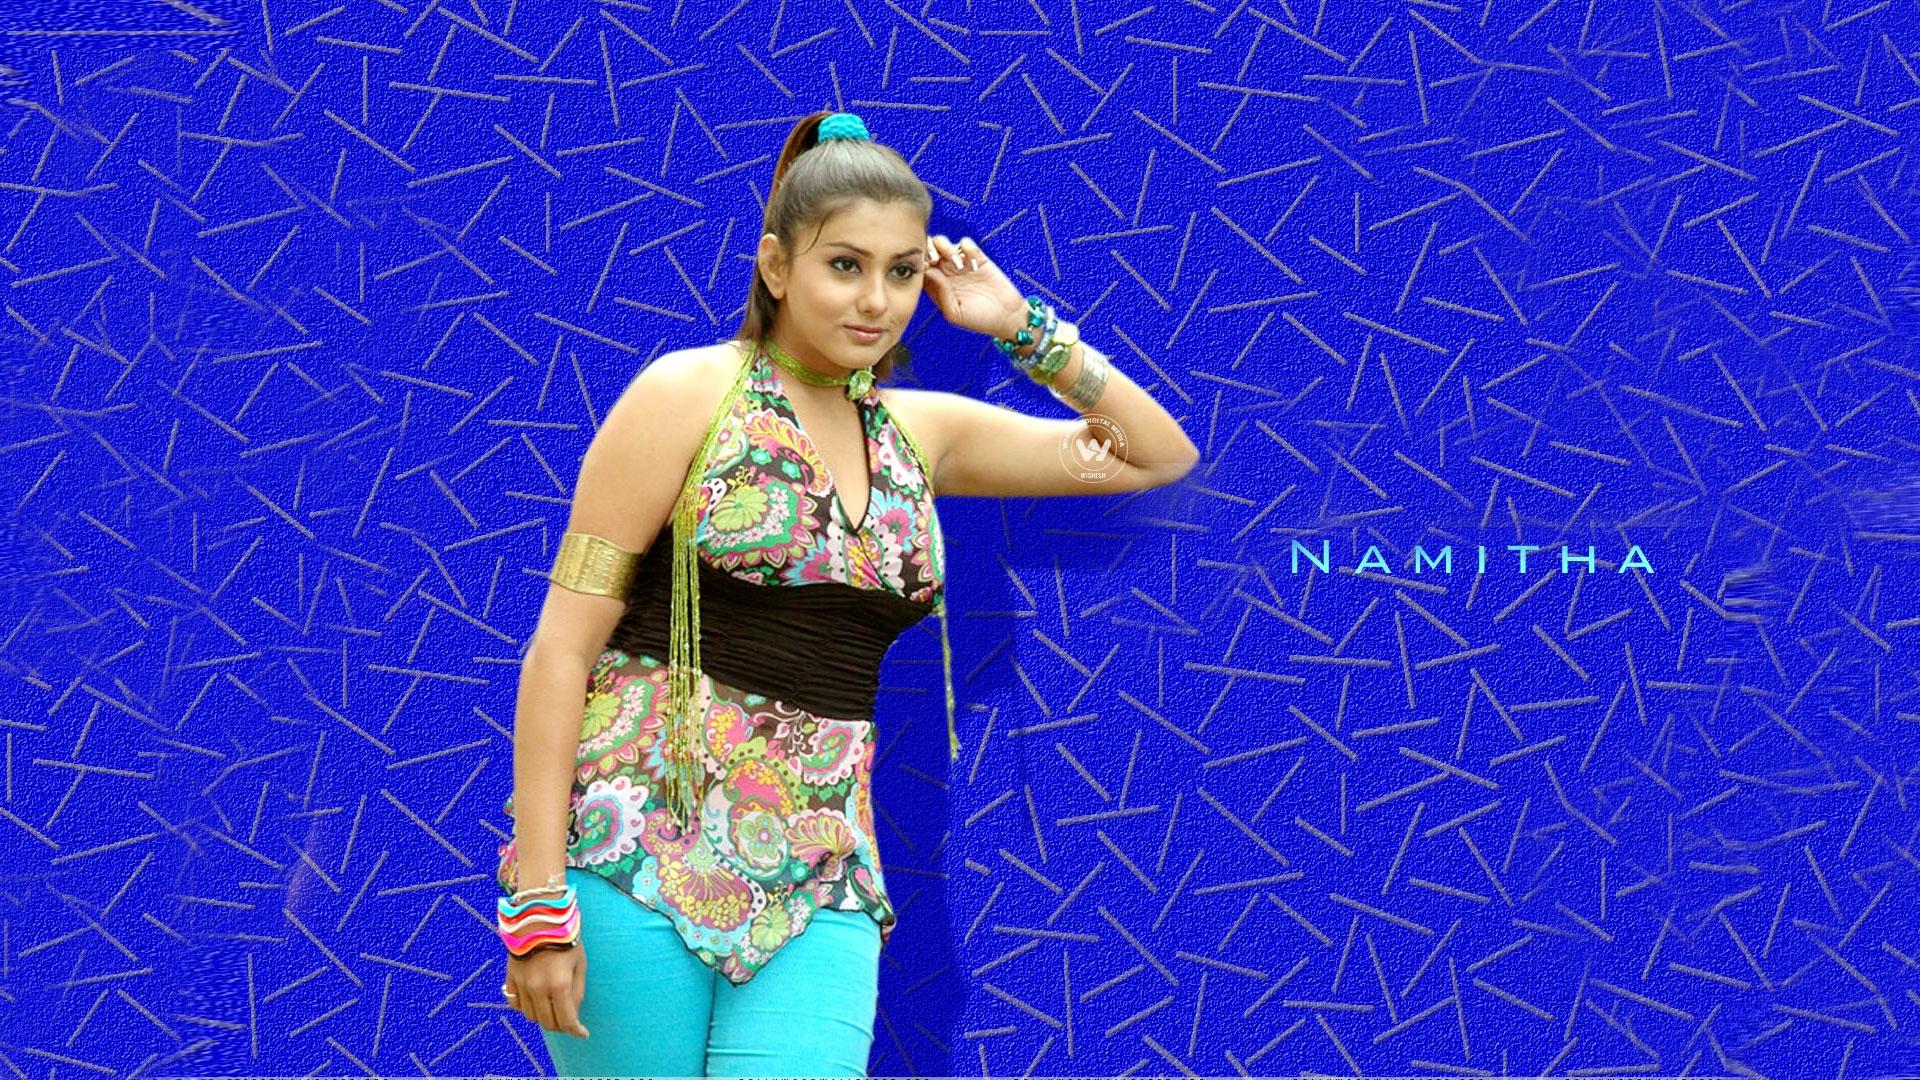 Actress namitha photos